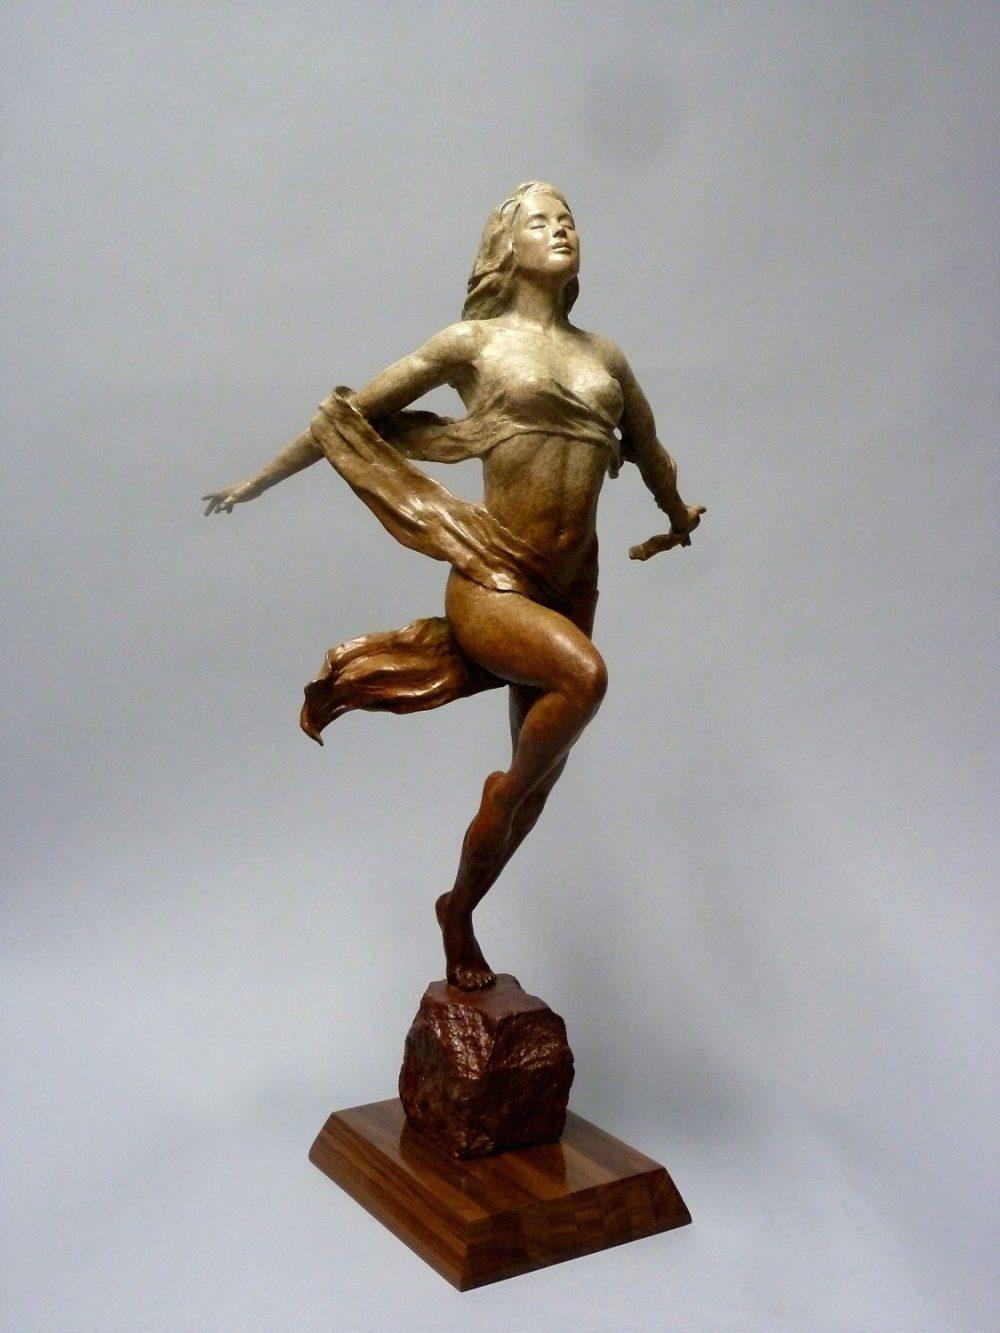 I Am | Scy Caroselli | Sculpture-Exposures International Gallery of Fine Art - Sedona AZ